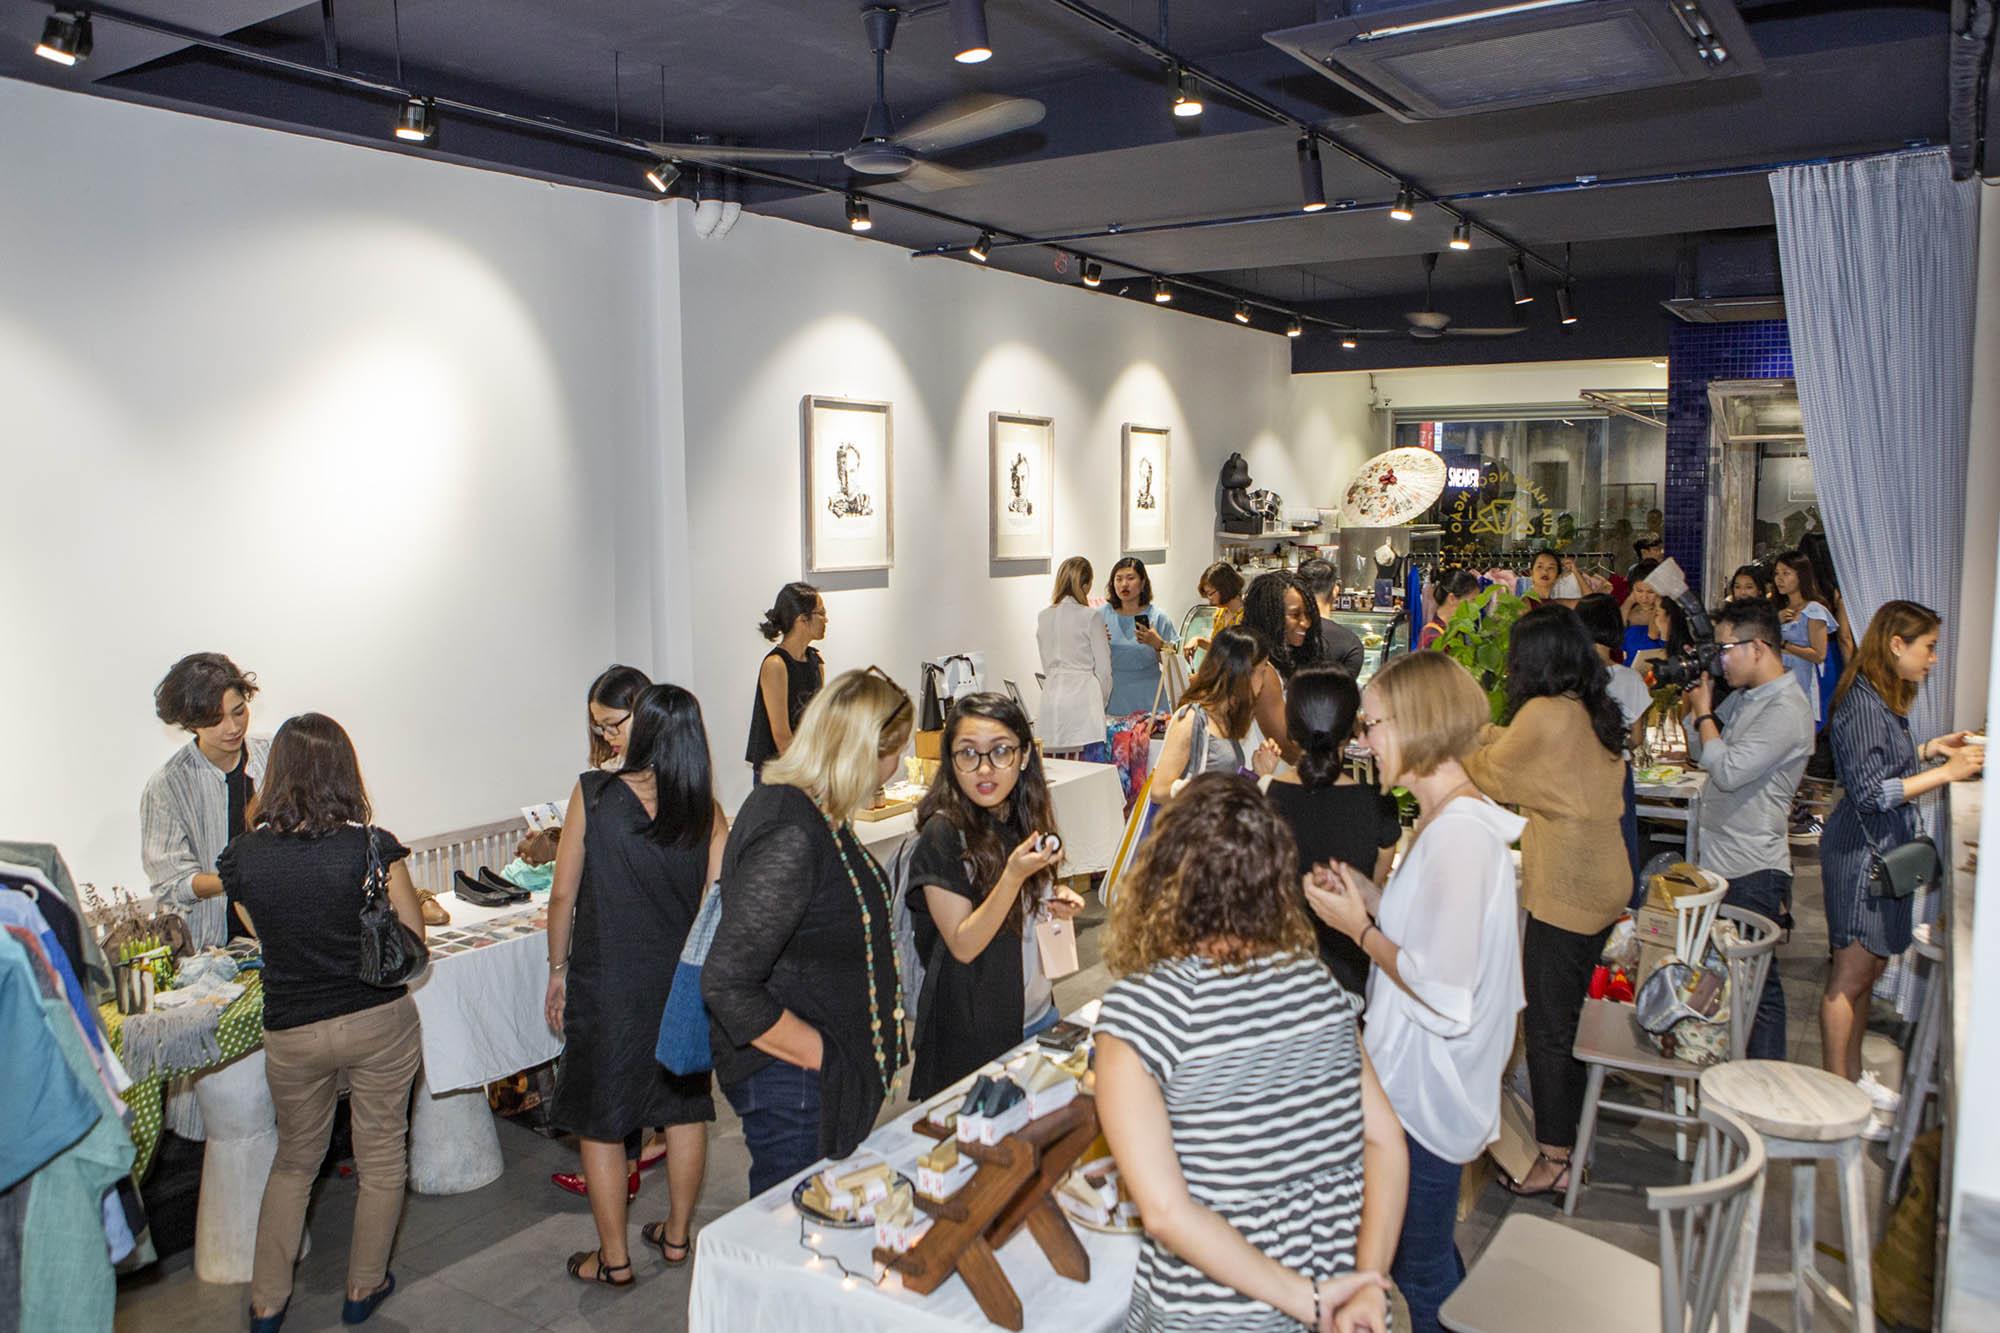 The Beehive: Creating A Community For Female Entrepreneurship